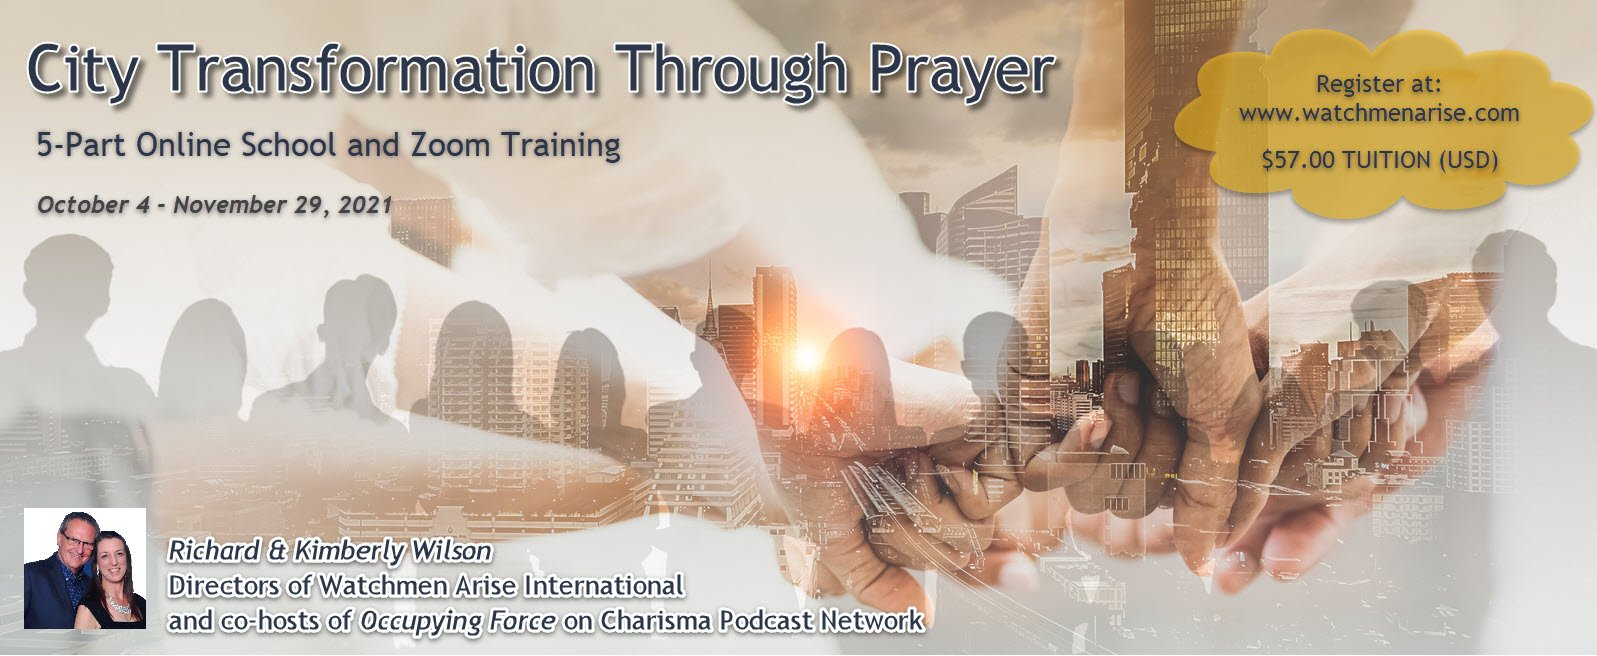 City Transformation Through Prayer